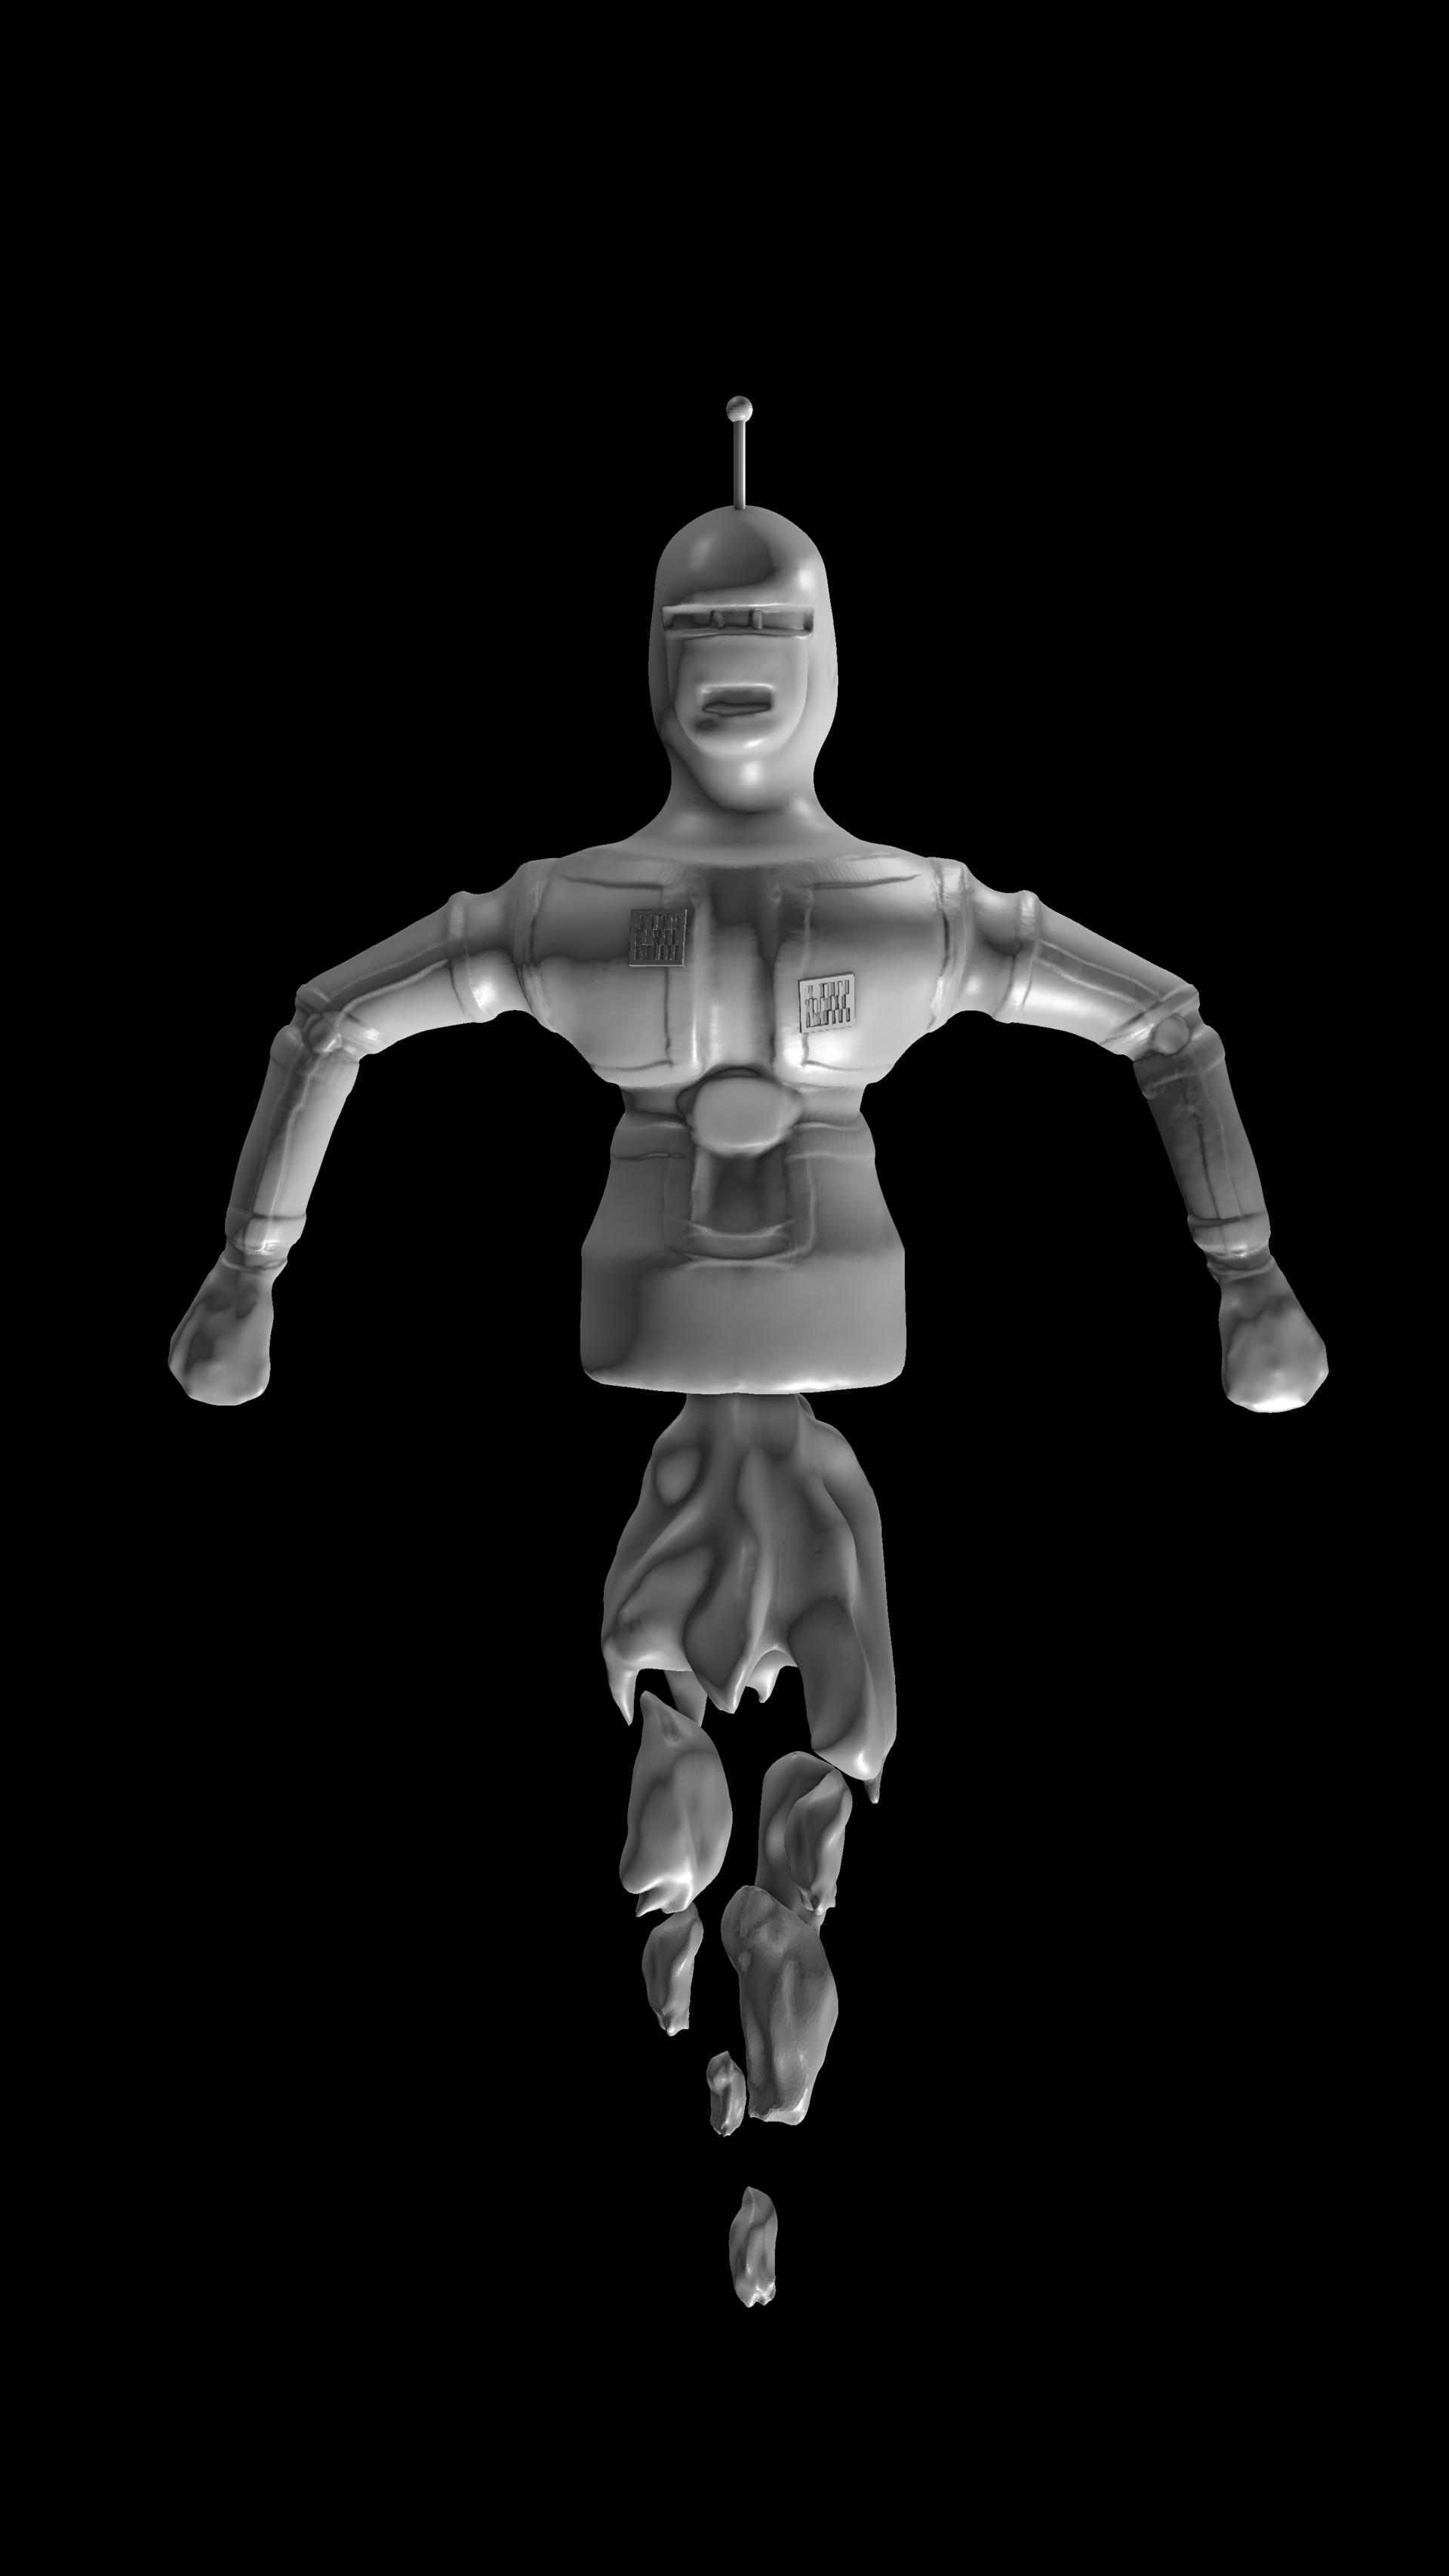 Johna aae 28 robot